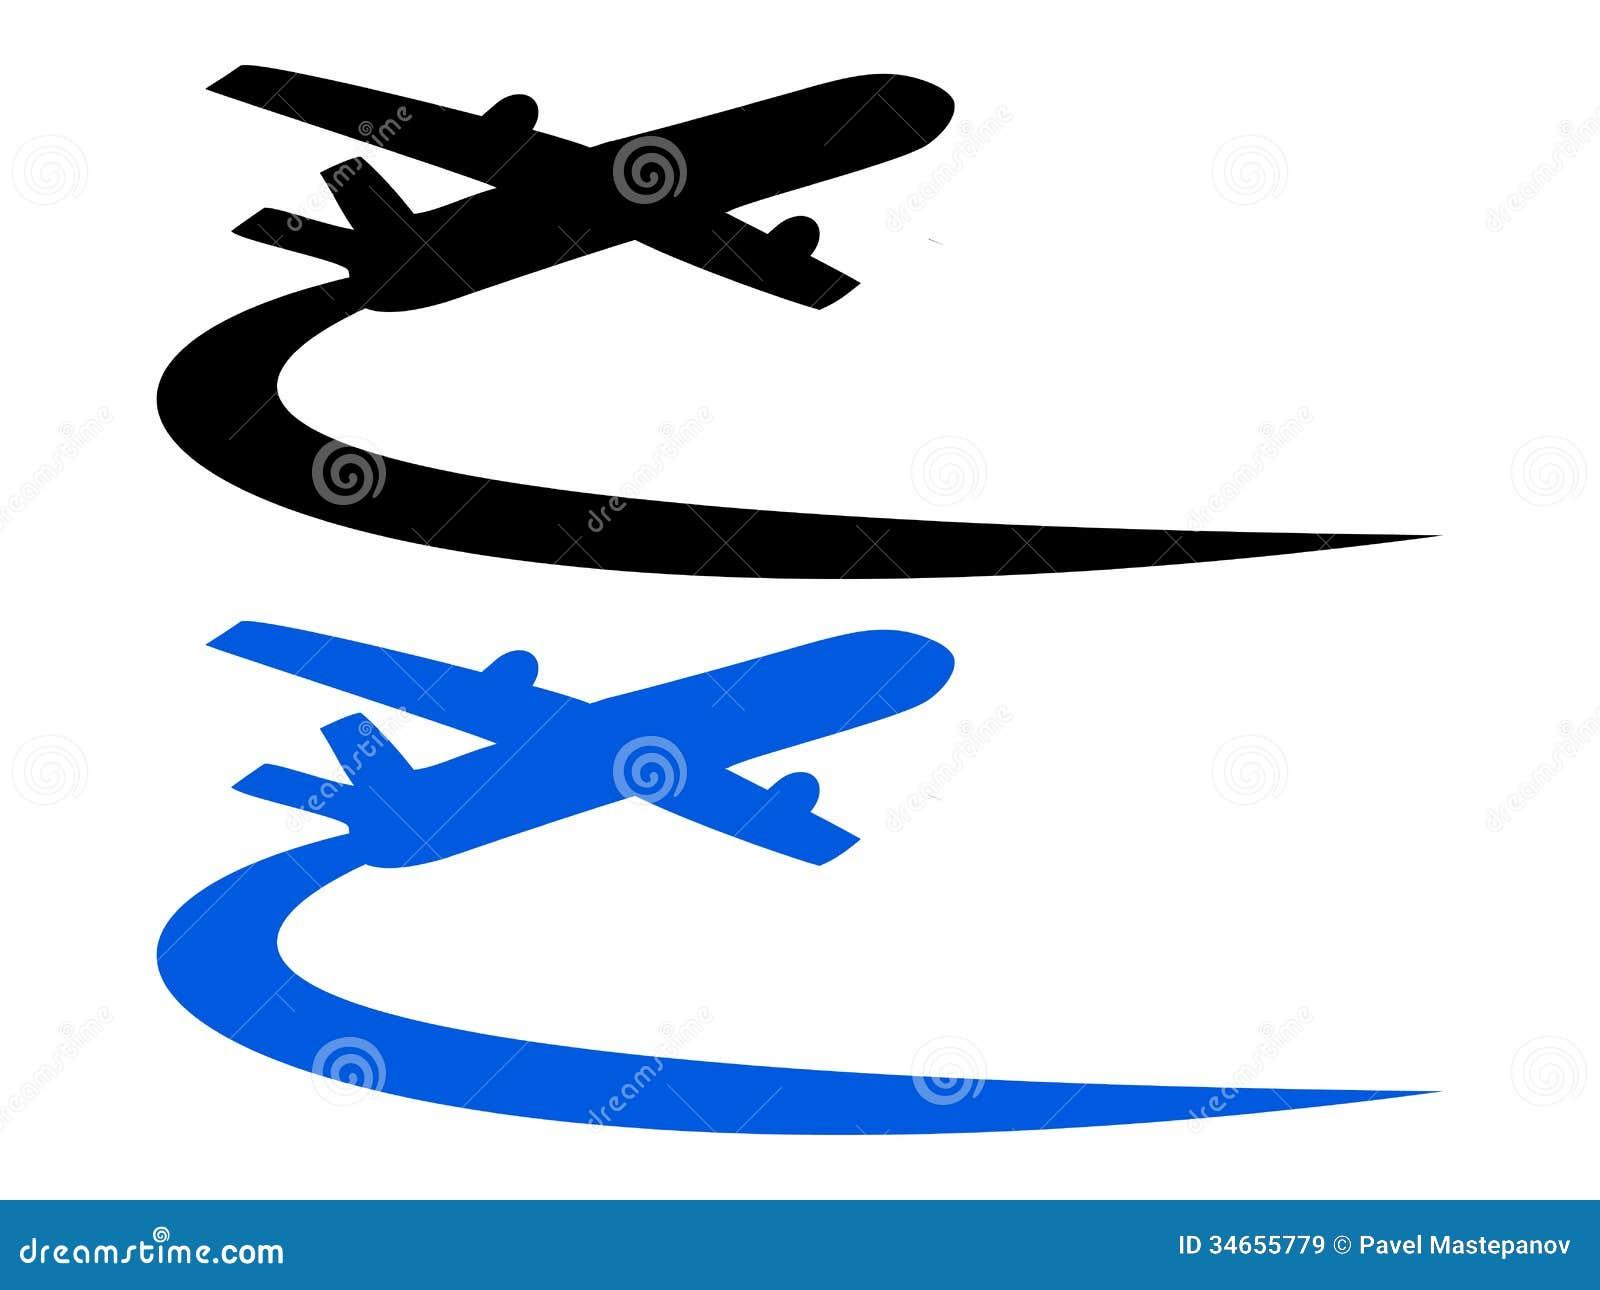 Airplane symbol design stock vector illustration of speed 34655779 airplane symbol design buycottarizona Gallery